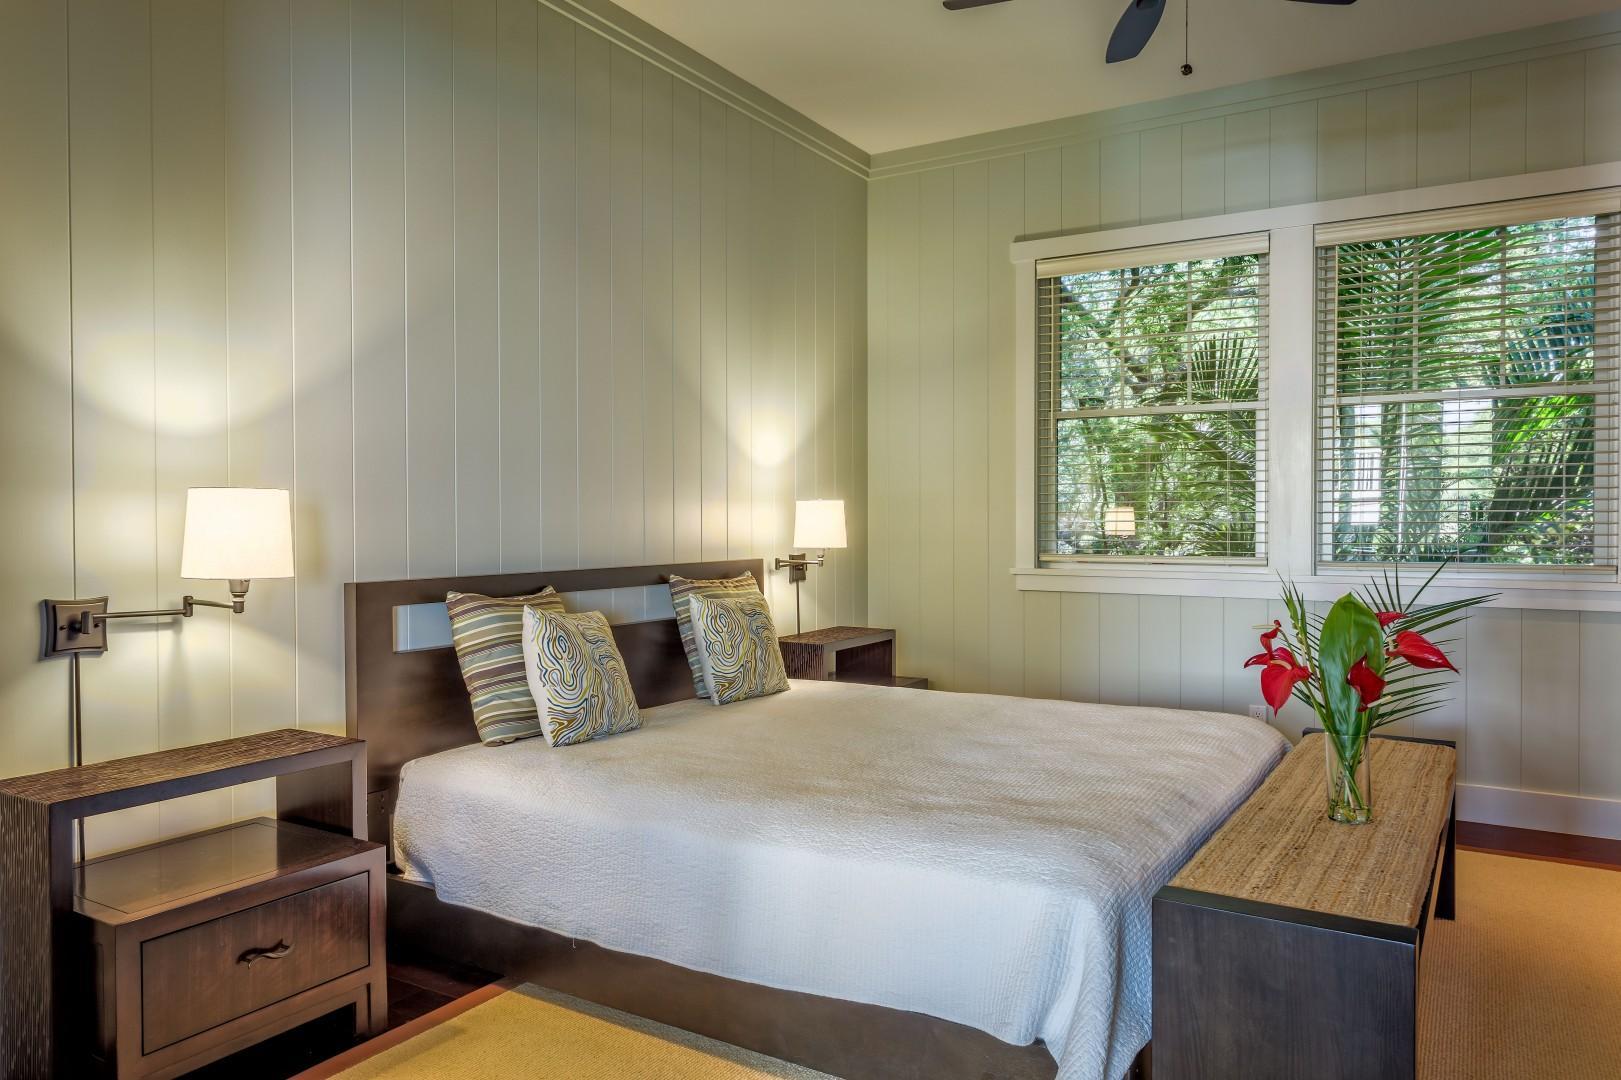 Bedroom 2 w/ King Size Bed, Split Air-Conditioning, Flat Screen Smart TV, Ensuite Bath, Ocean View from Double Pocket Doors to Hallway.